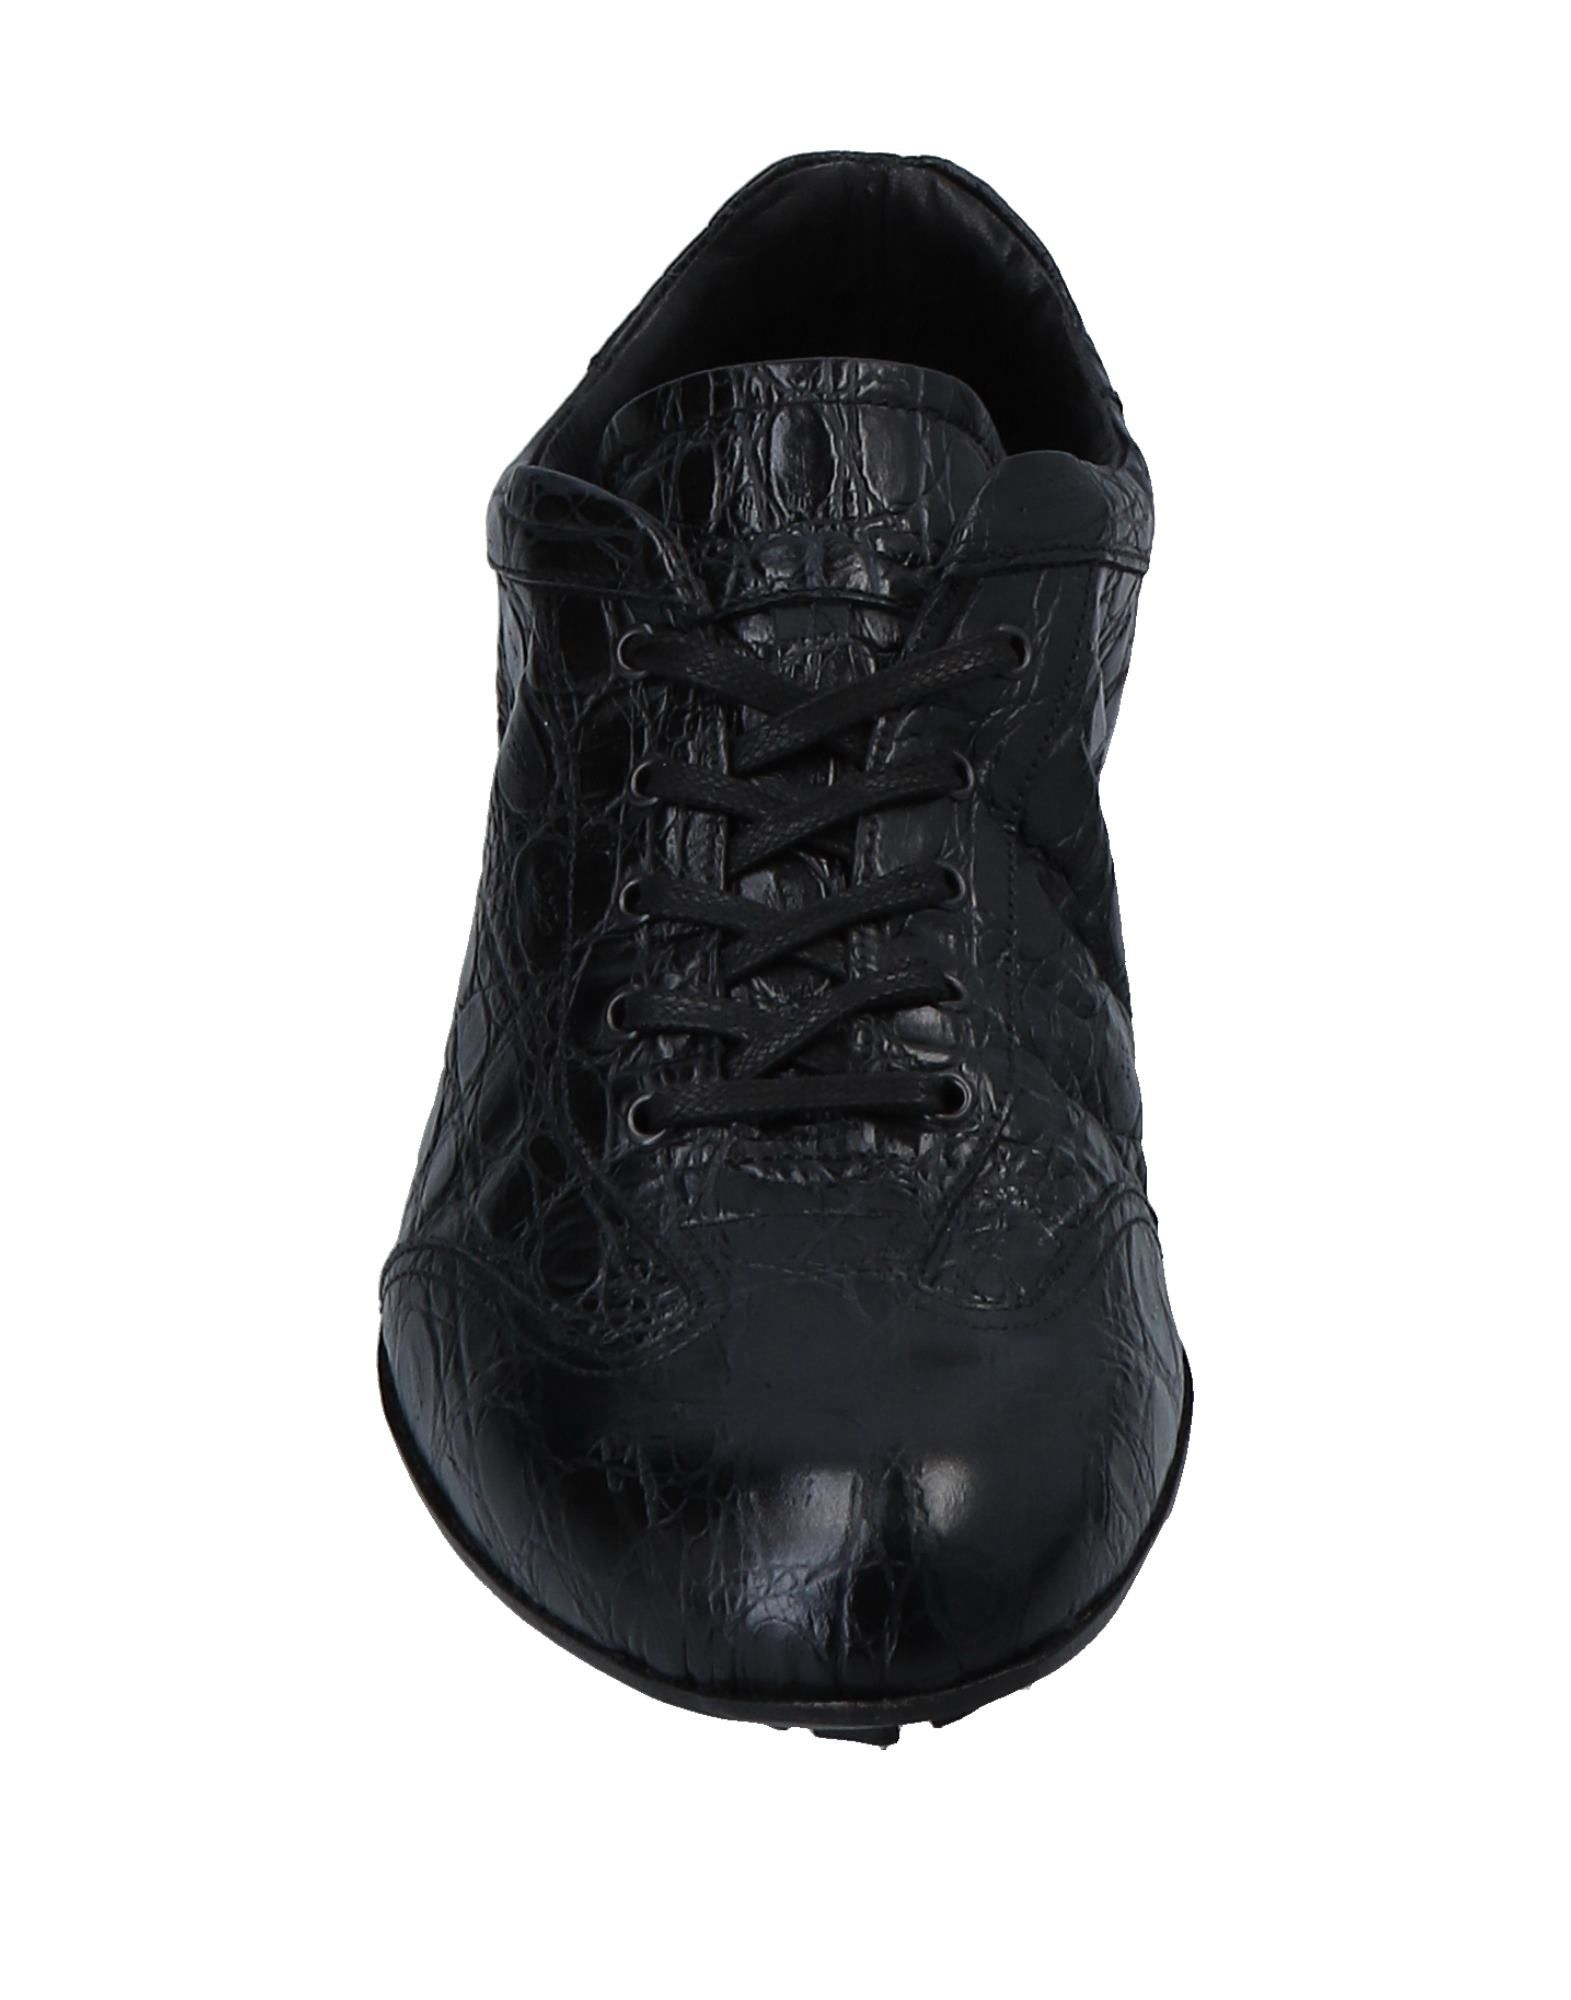 Baldinini Gute Sneakers Herren  11554796VH Gute Baldinini Qualität beliebte Schuhe 680594